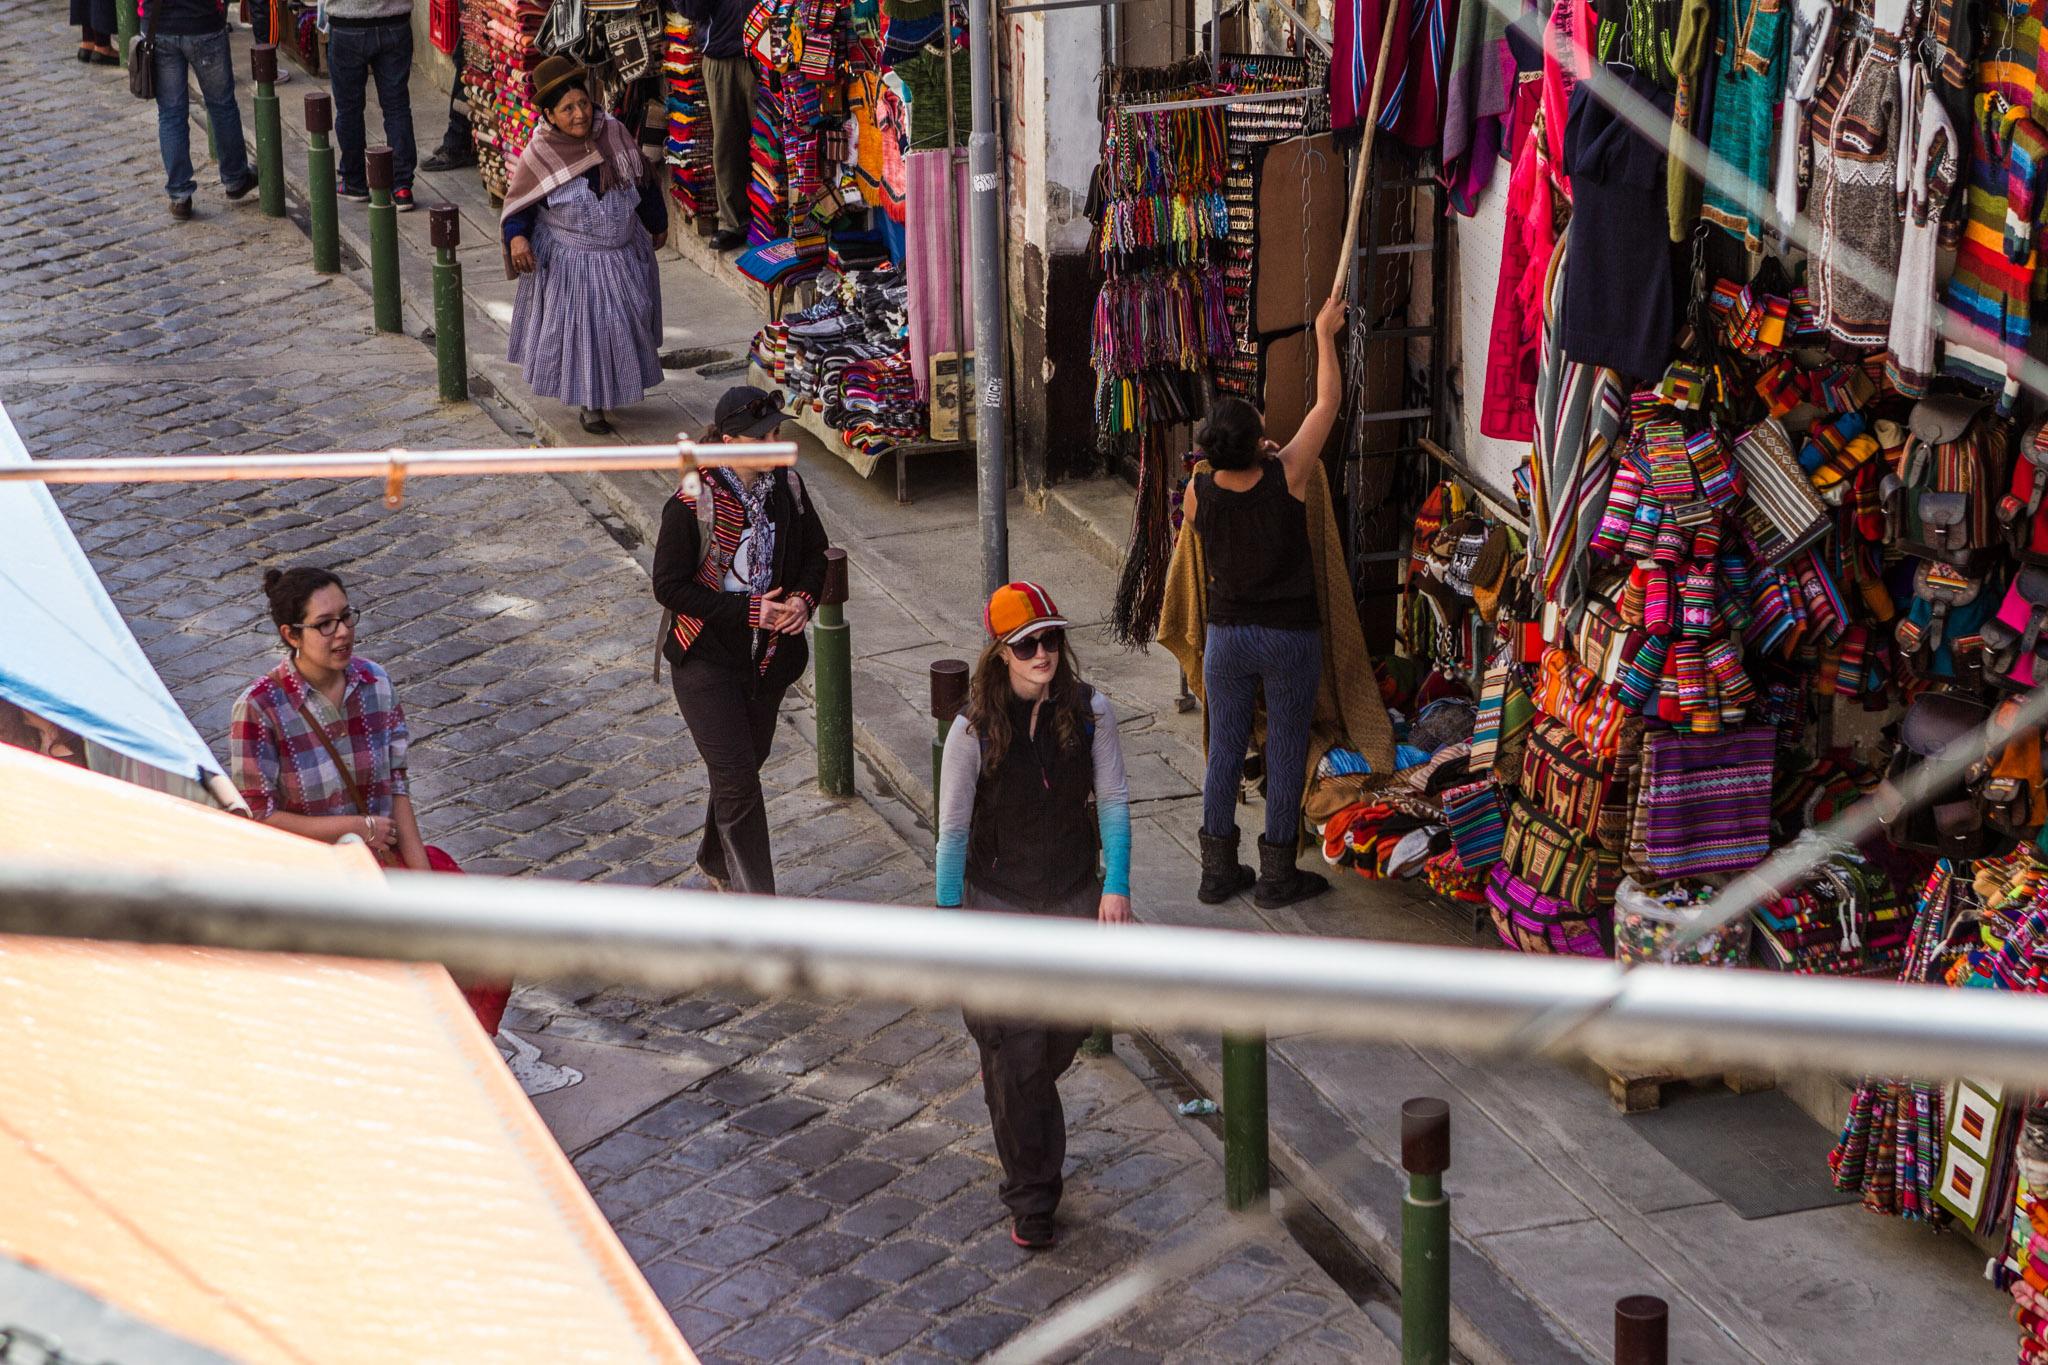 Ali-Barqawi-Studios-Explore-Series-Travel-Adventure-Documentary-C4CGAZA-Bolivia-LaPaz-2015-006.jpg